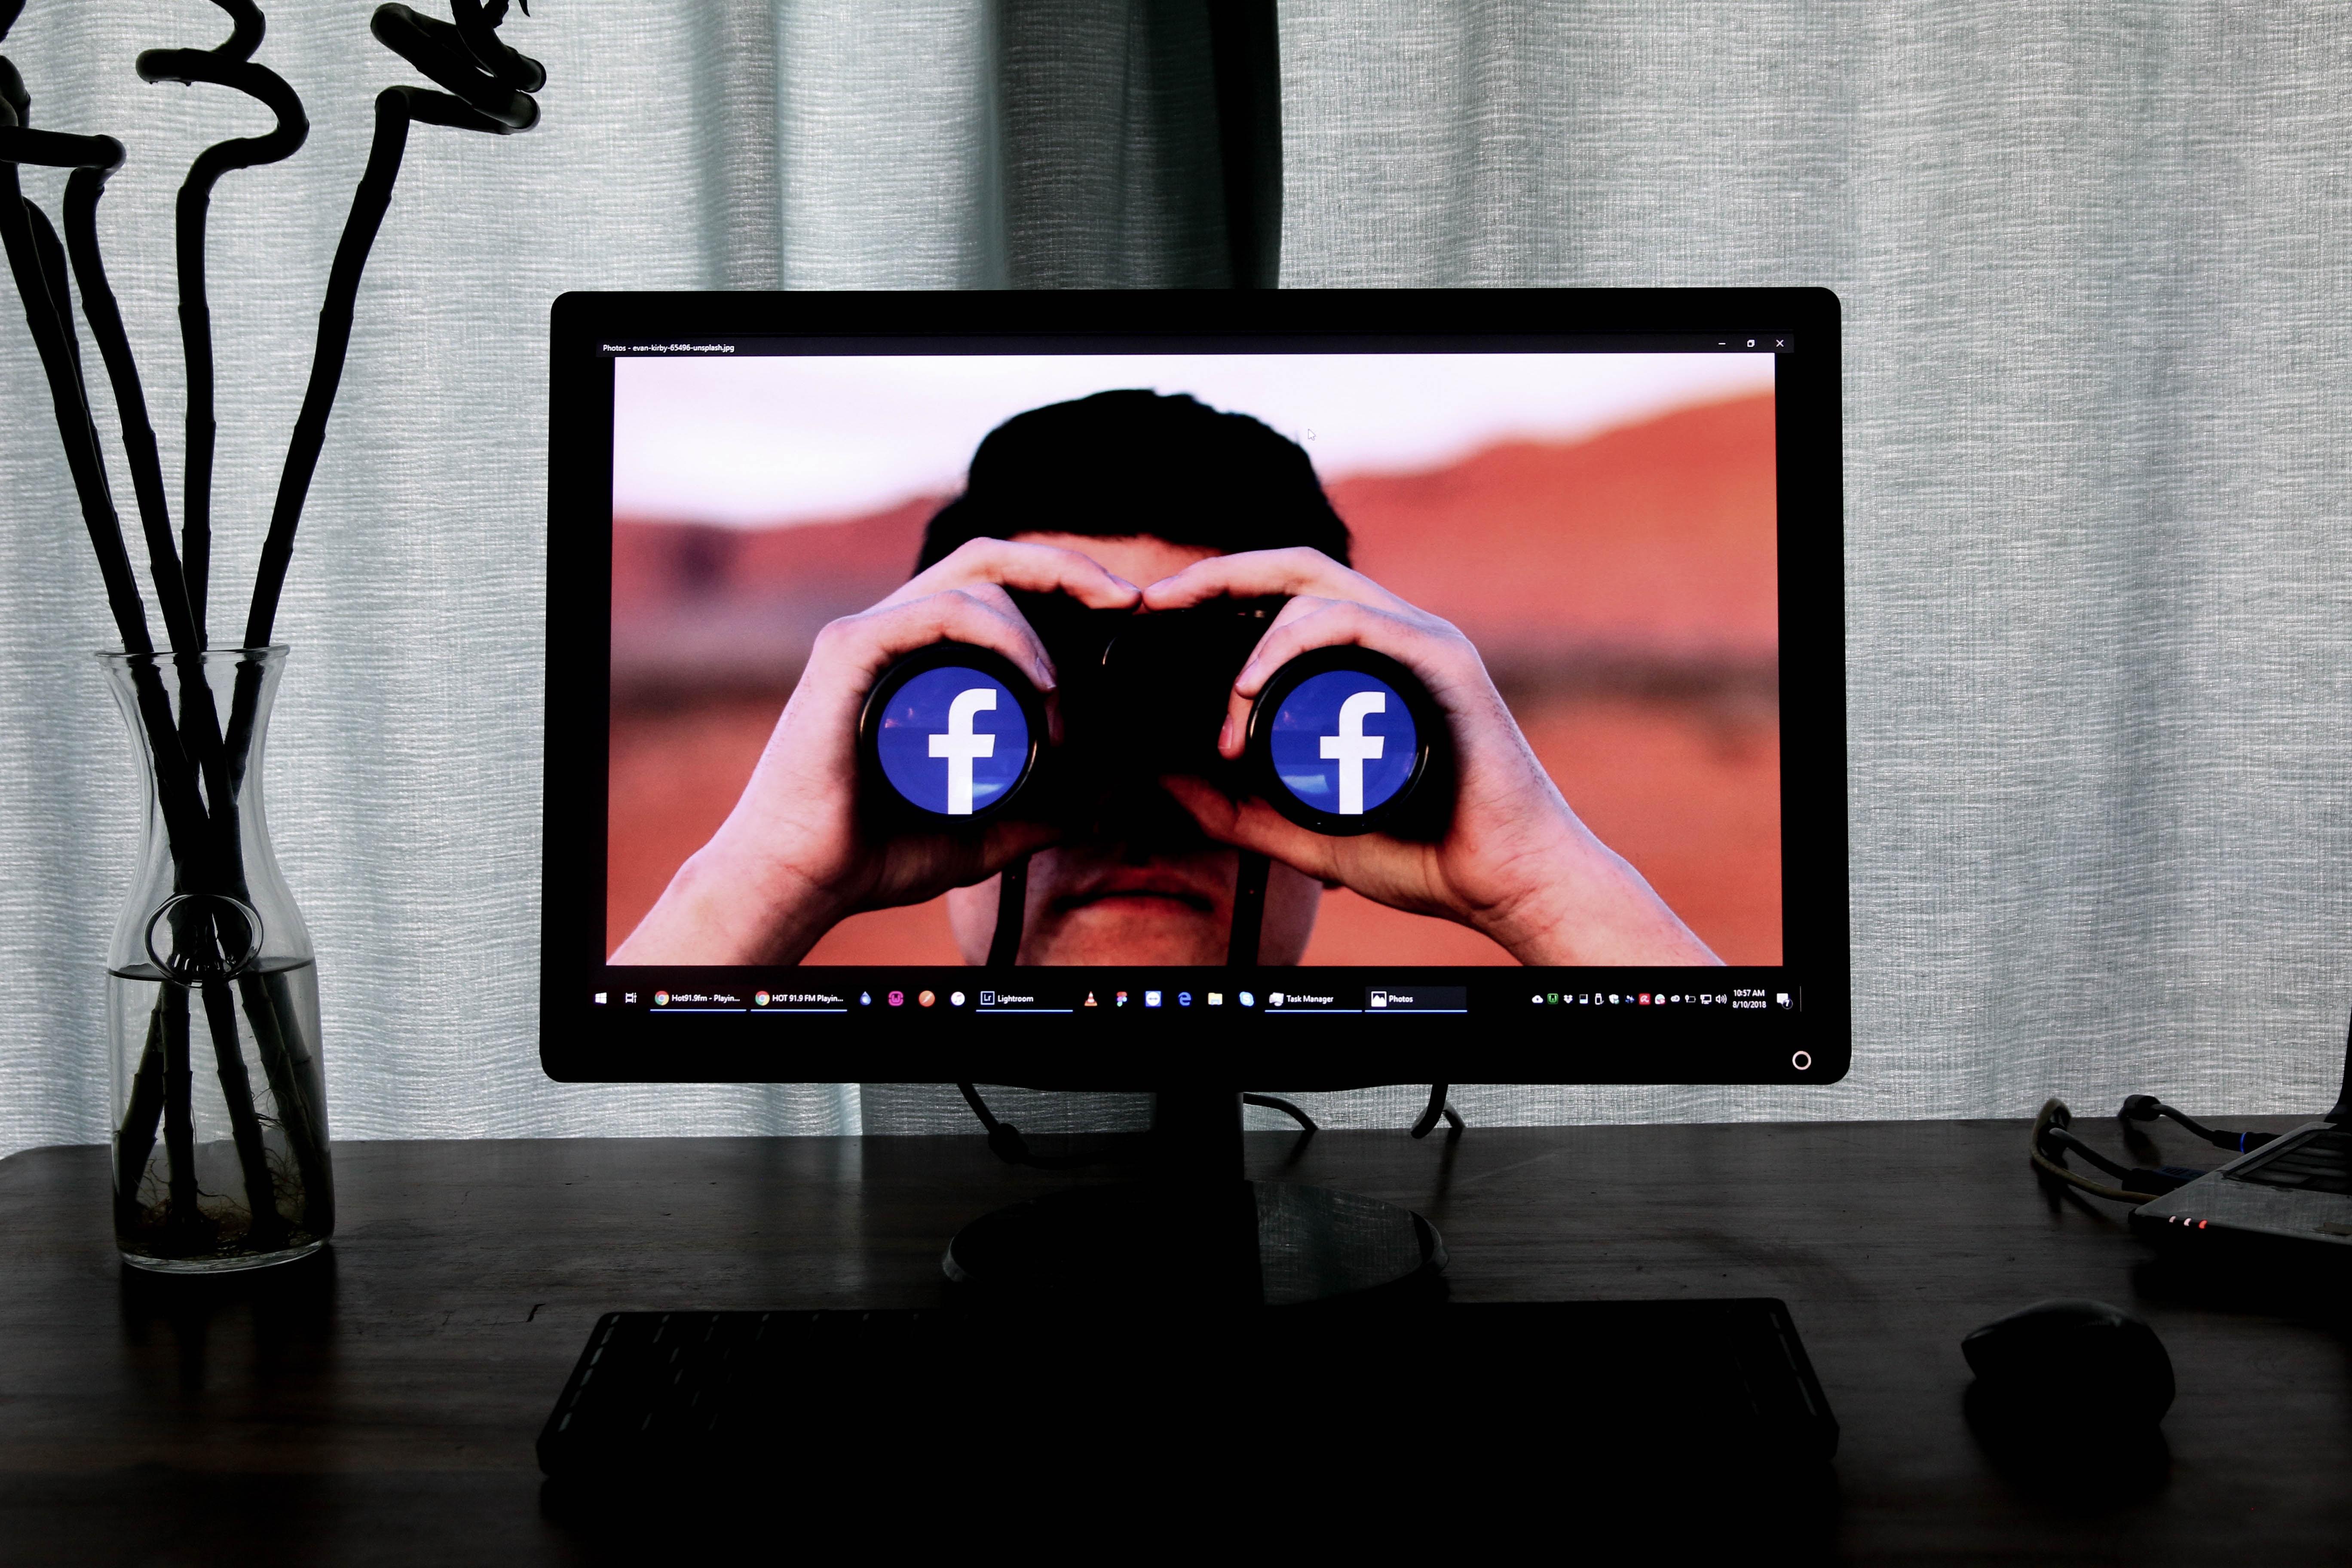 facebook 5 billion fine 364x205 - Facebook will pay a $5 billion fine for the Cambridge Analytica scandal